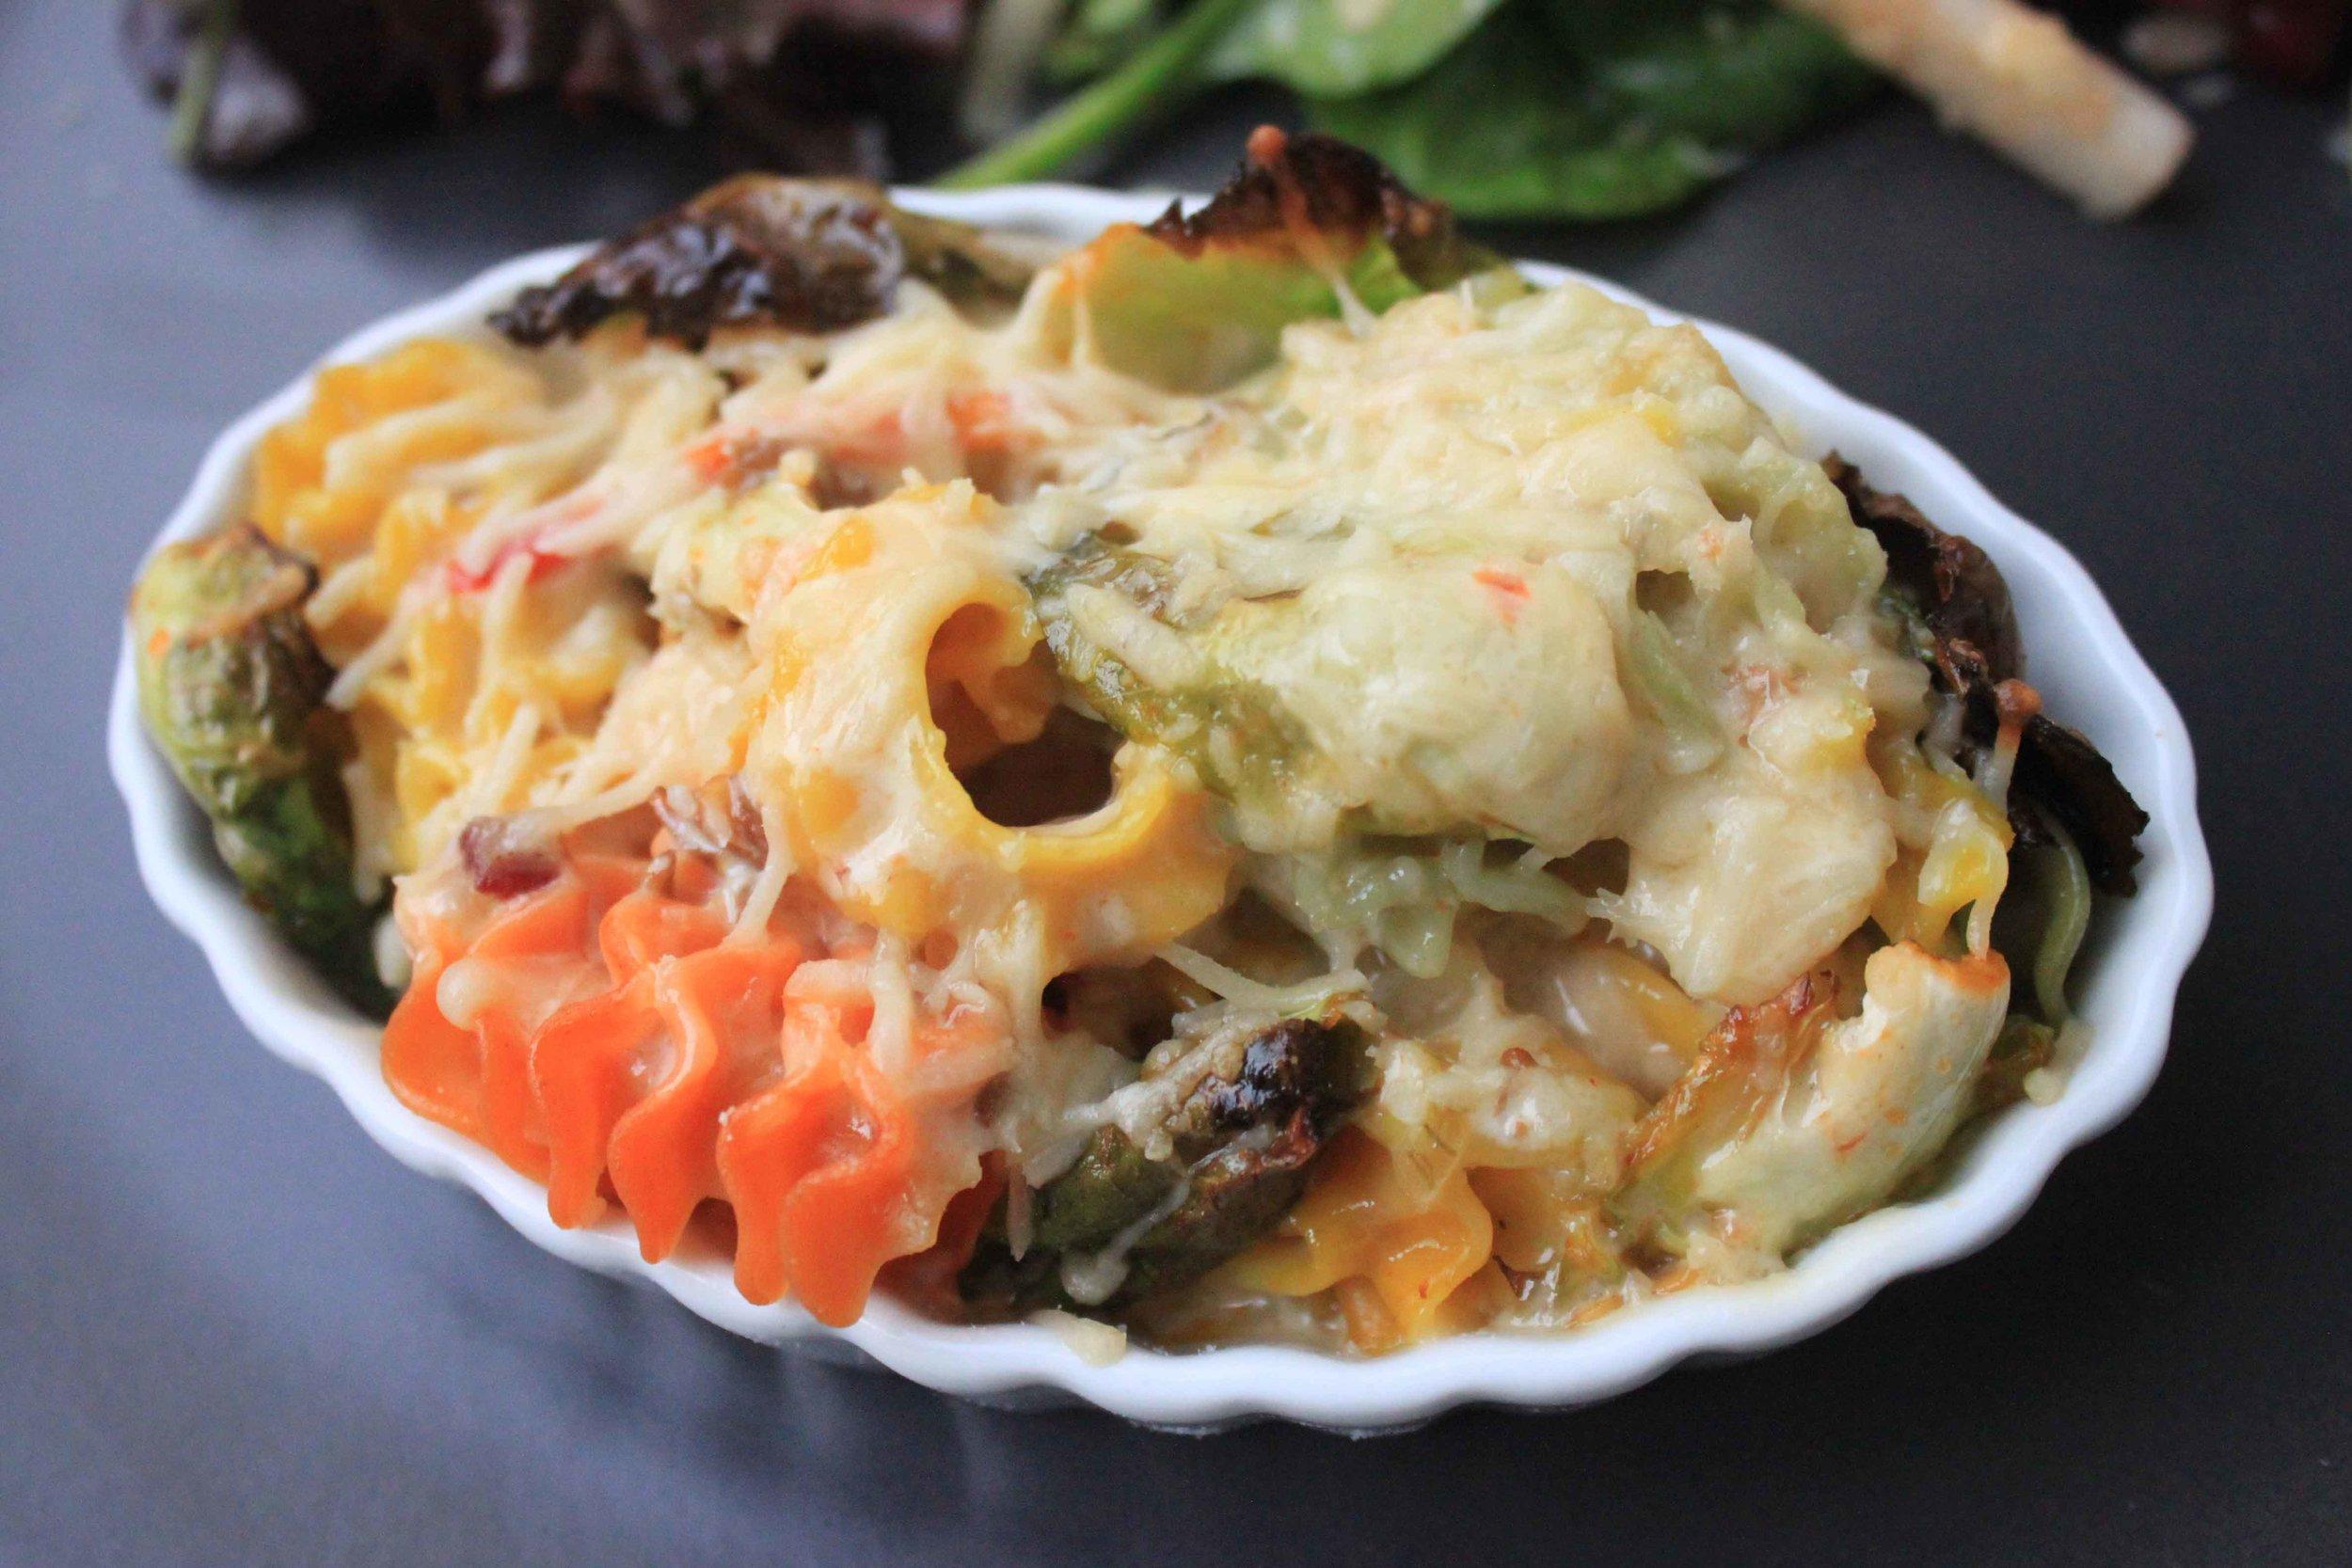 flatiron room macaroni and cheese recipe charisma shah